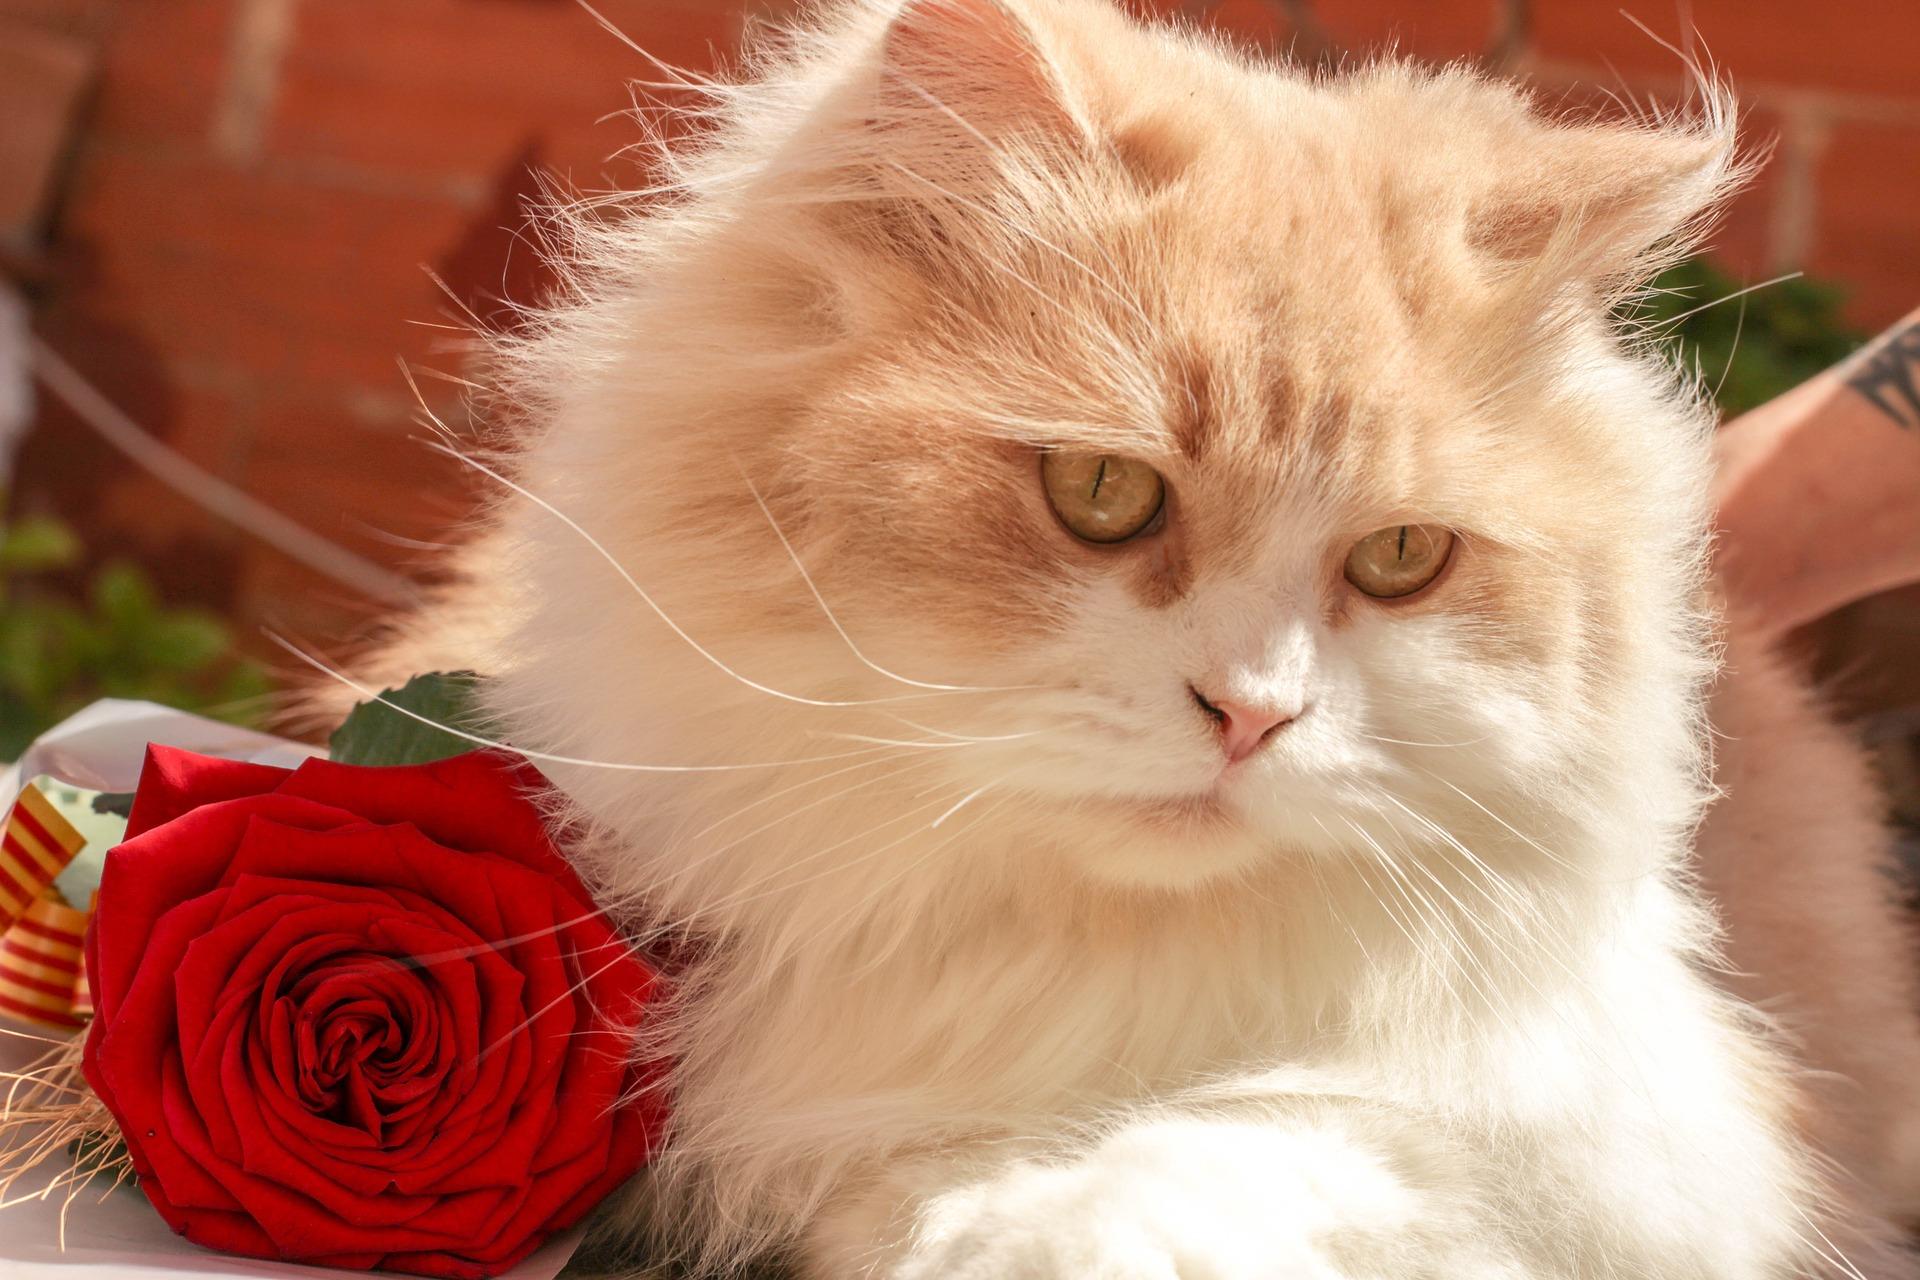 cat-1357884_1920.jpg